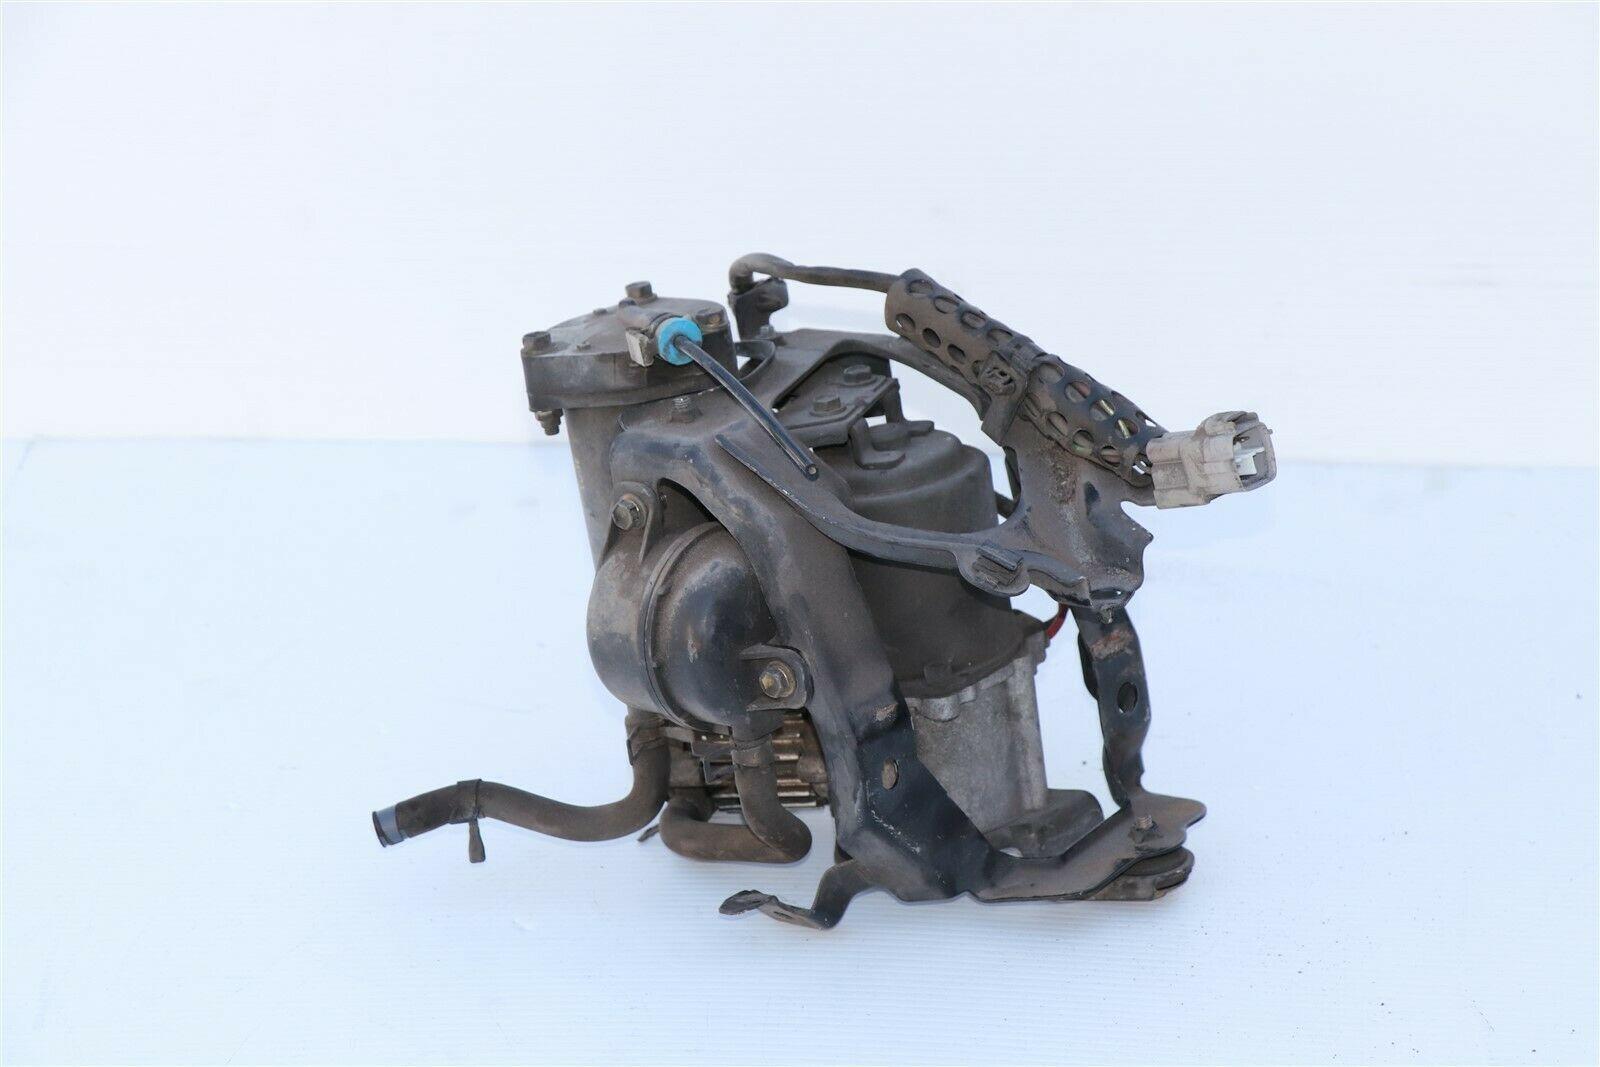 03-09 Lexus GX470 Air Suspension Compressor Ride Height Control Pump,